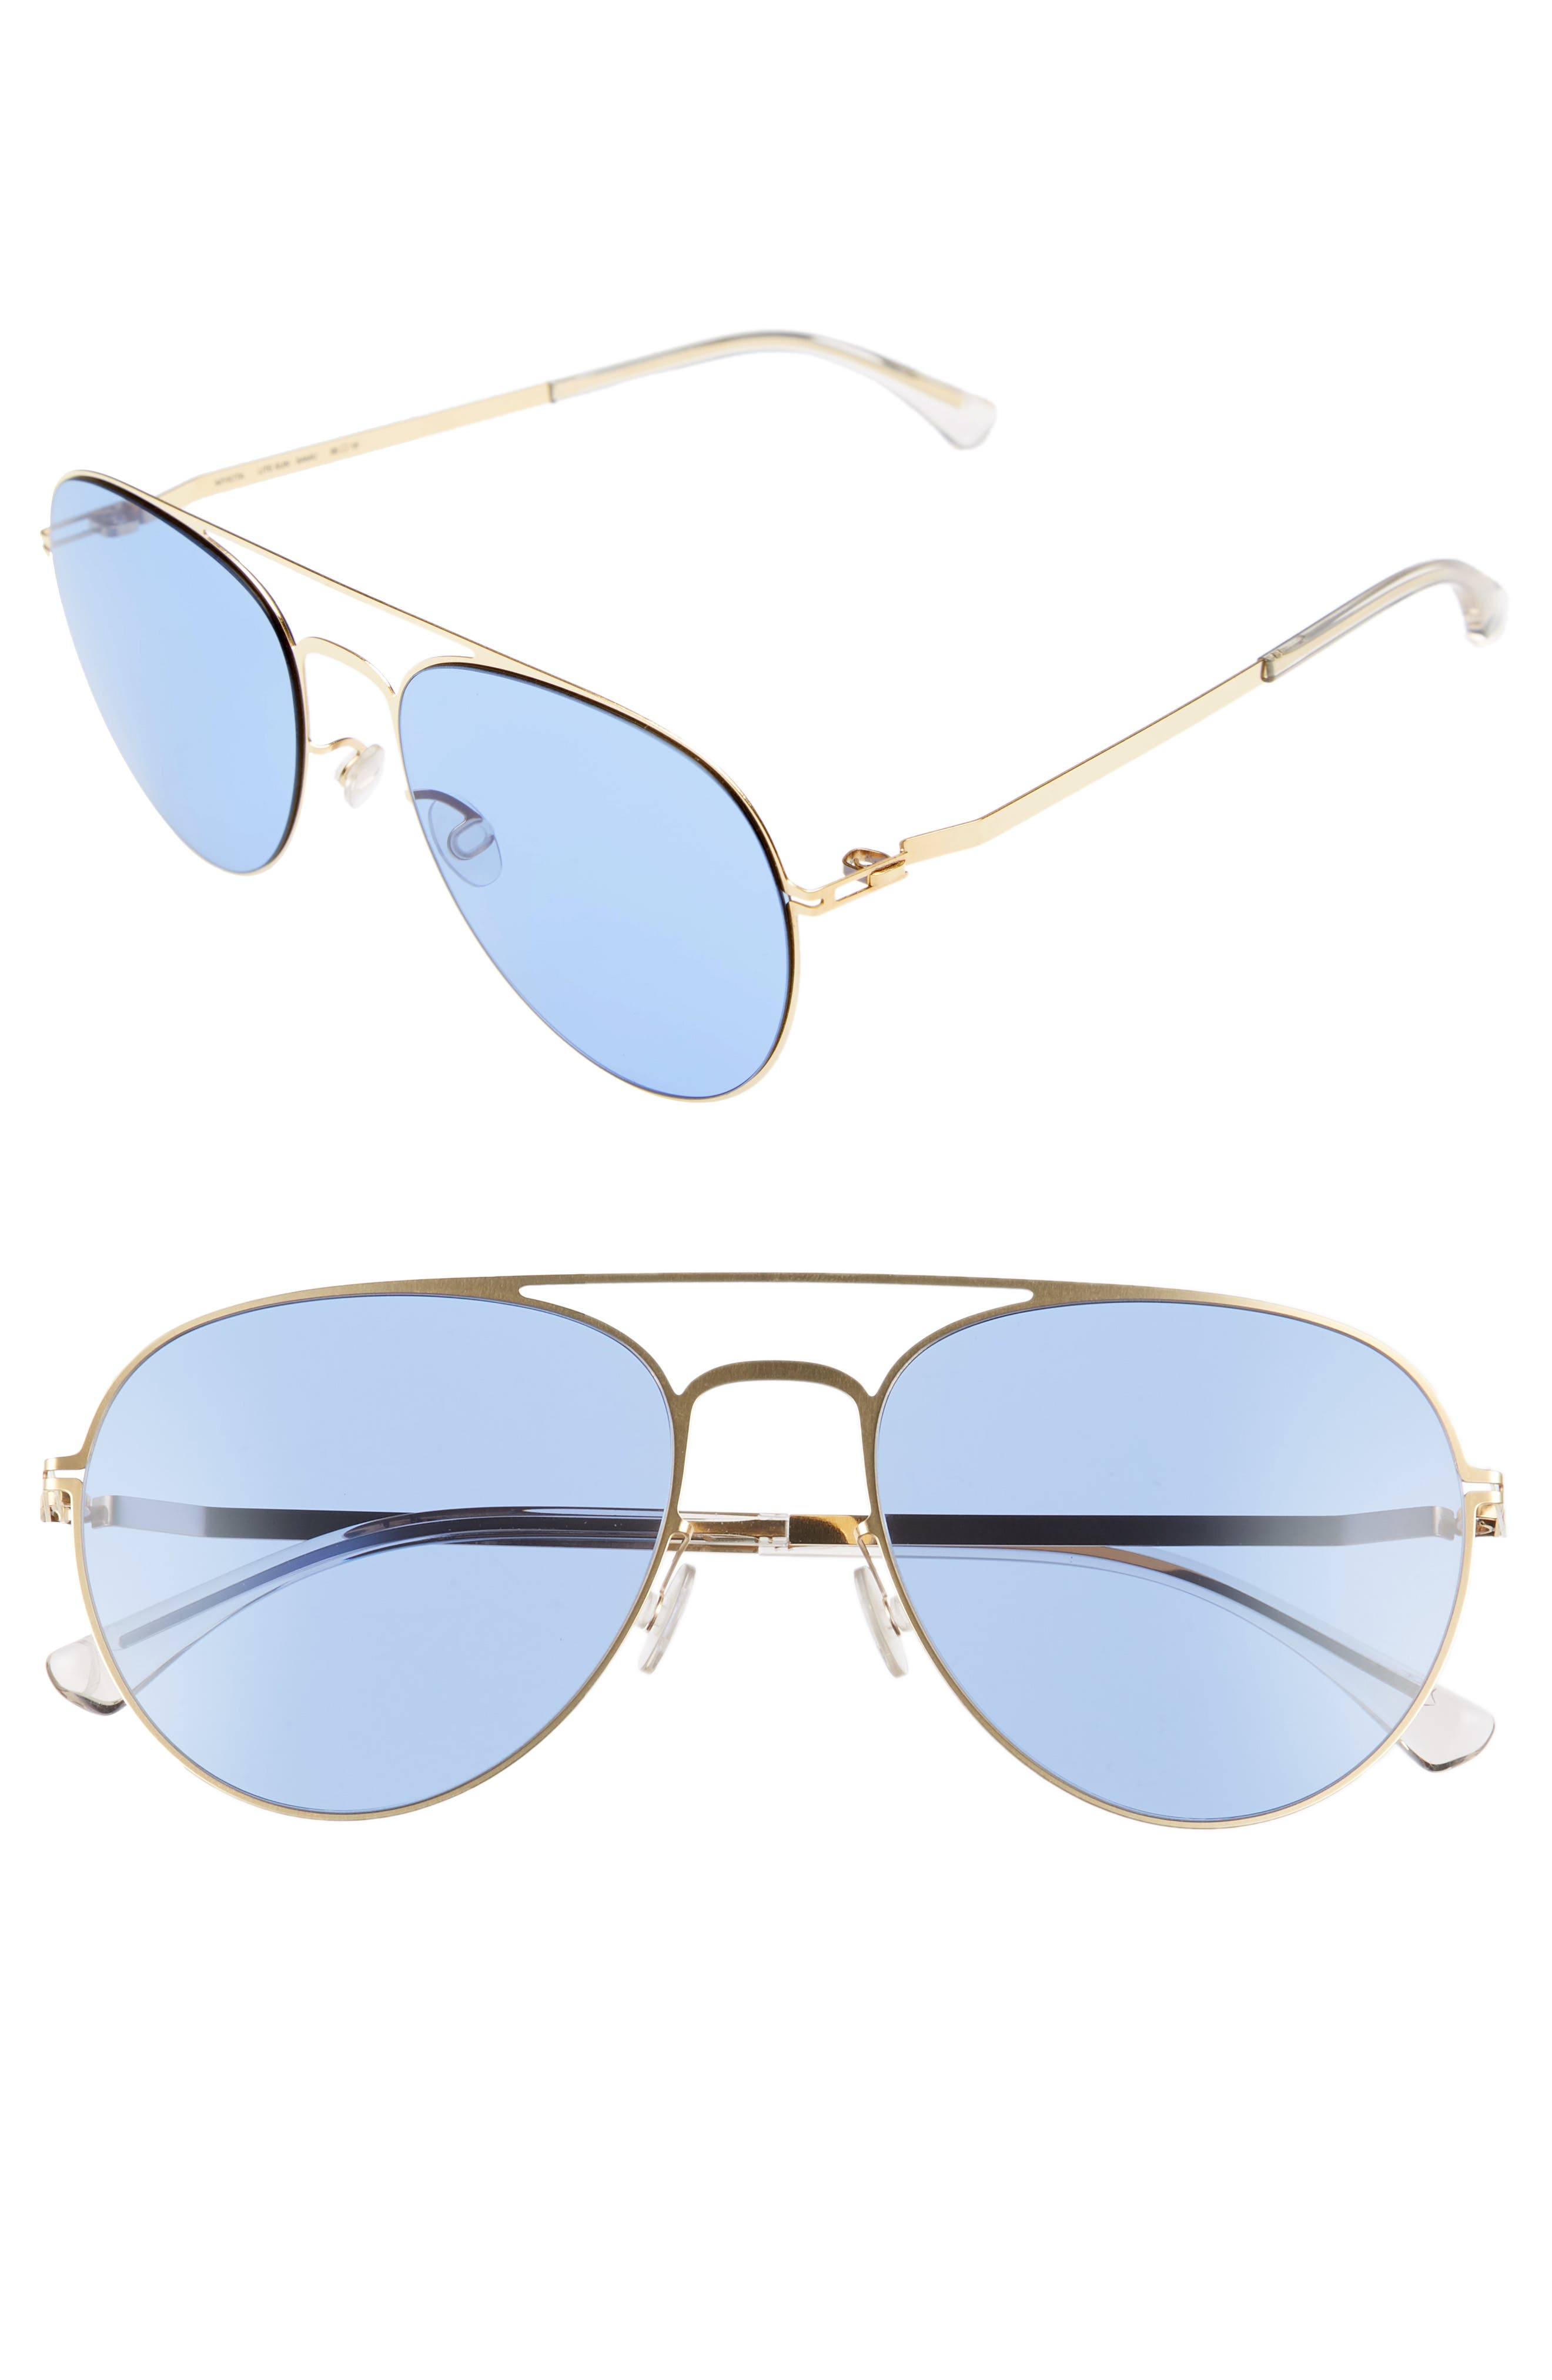 Samu 55mm Aviator Sunglasses,                         Main,                         color, Glossy Gold